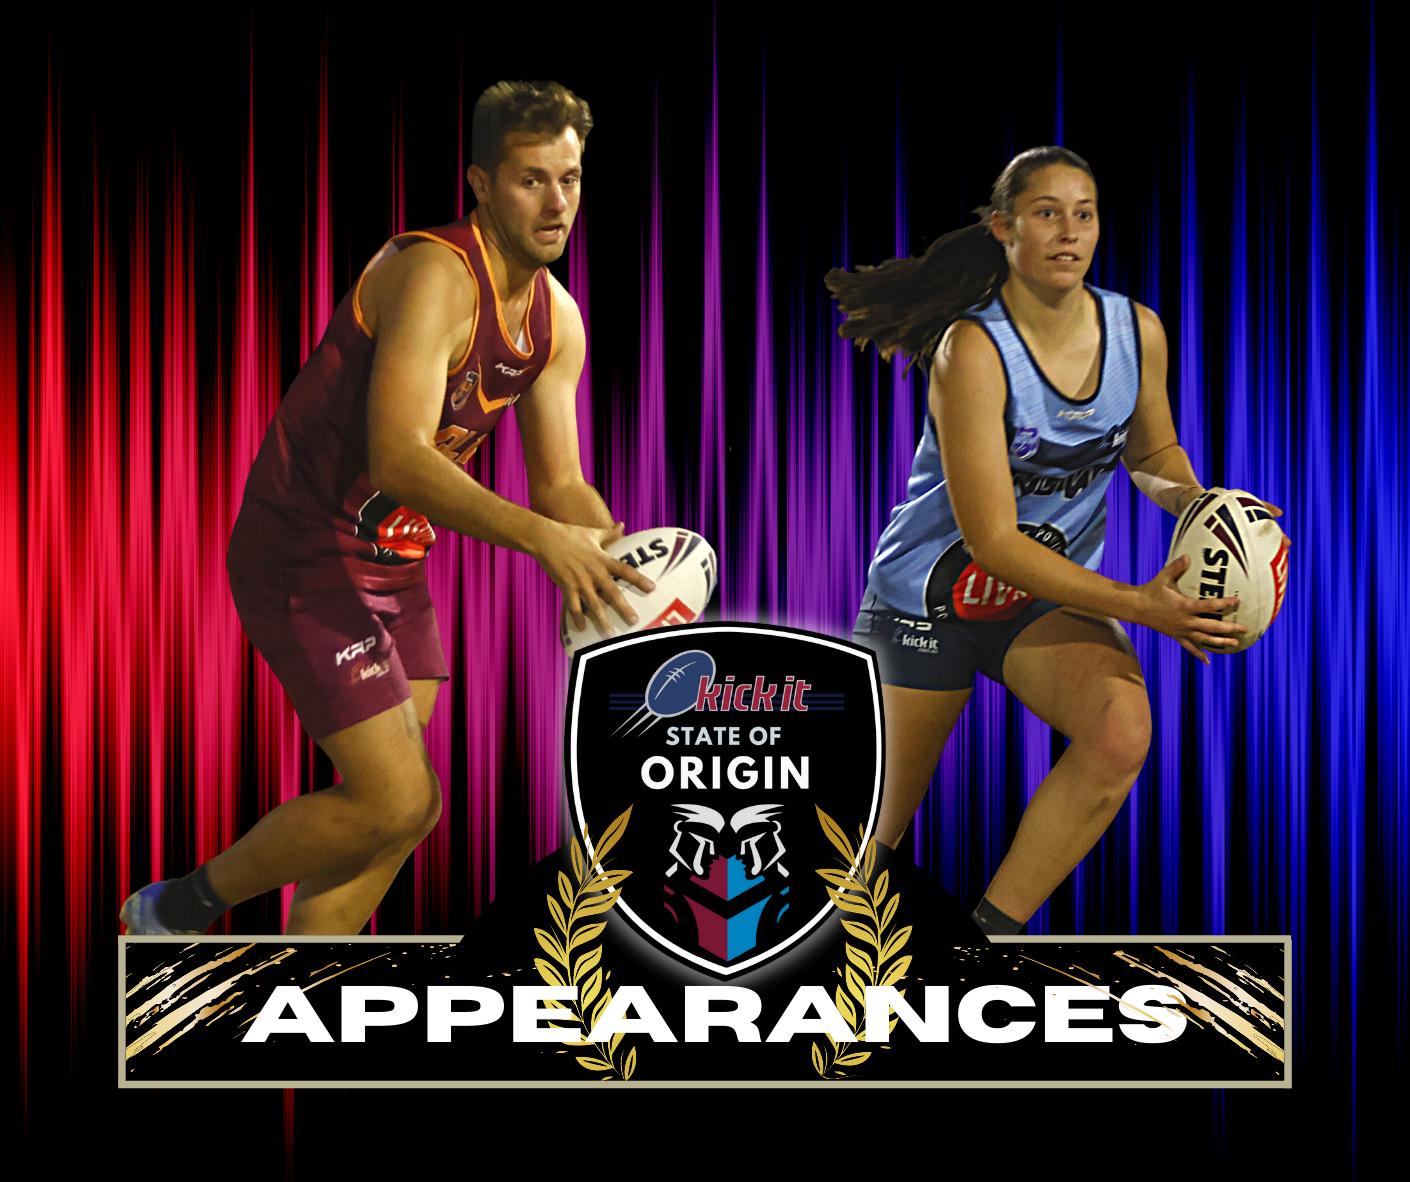 State of Origin Appearances